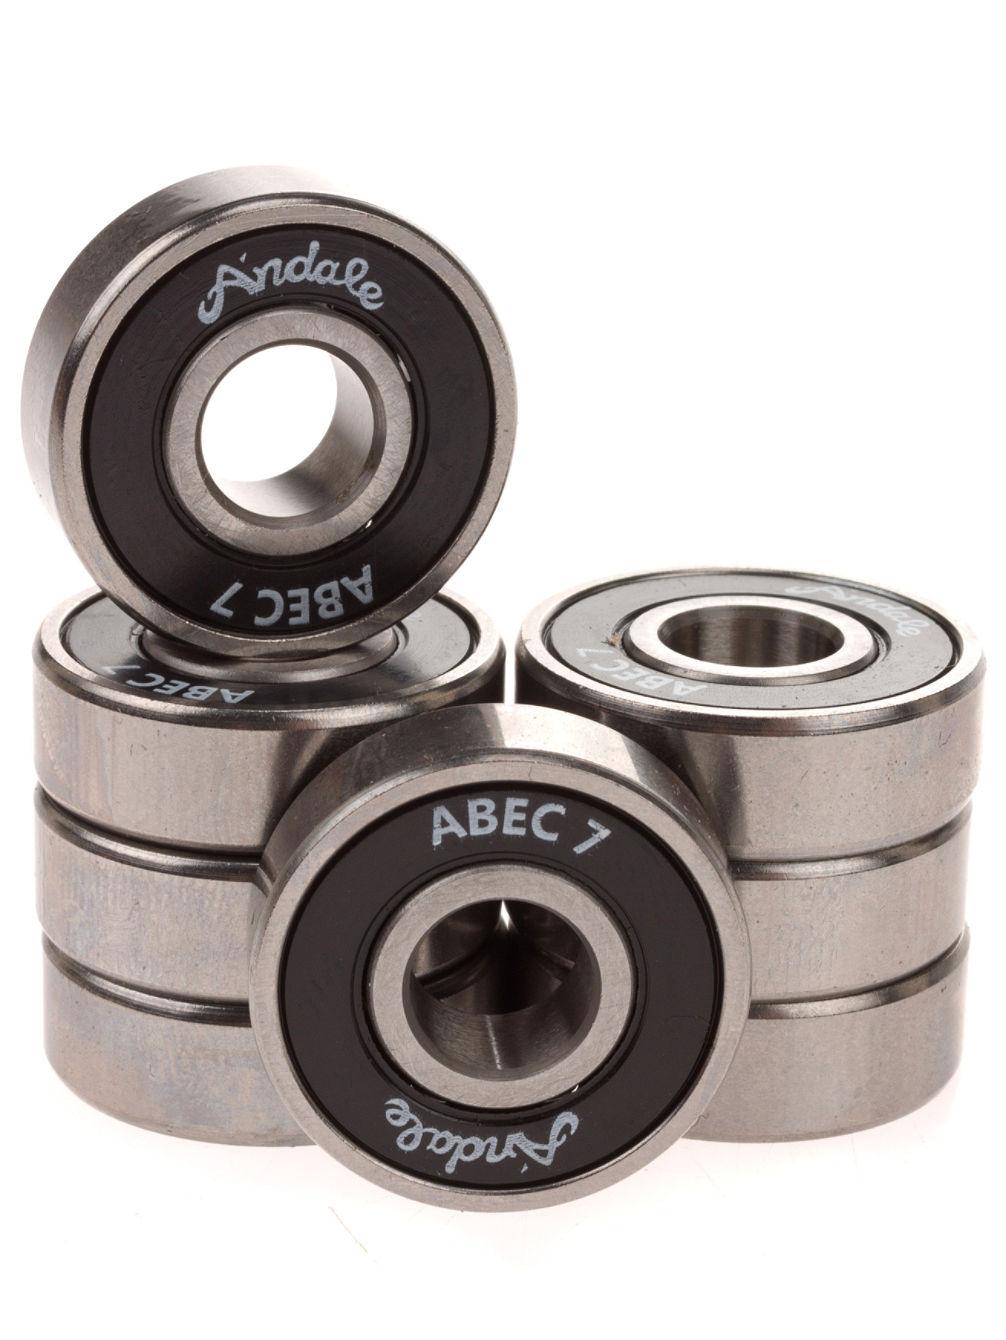 andale-bearings-abec-7-bearings